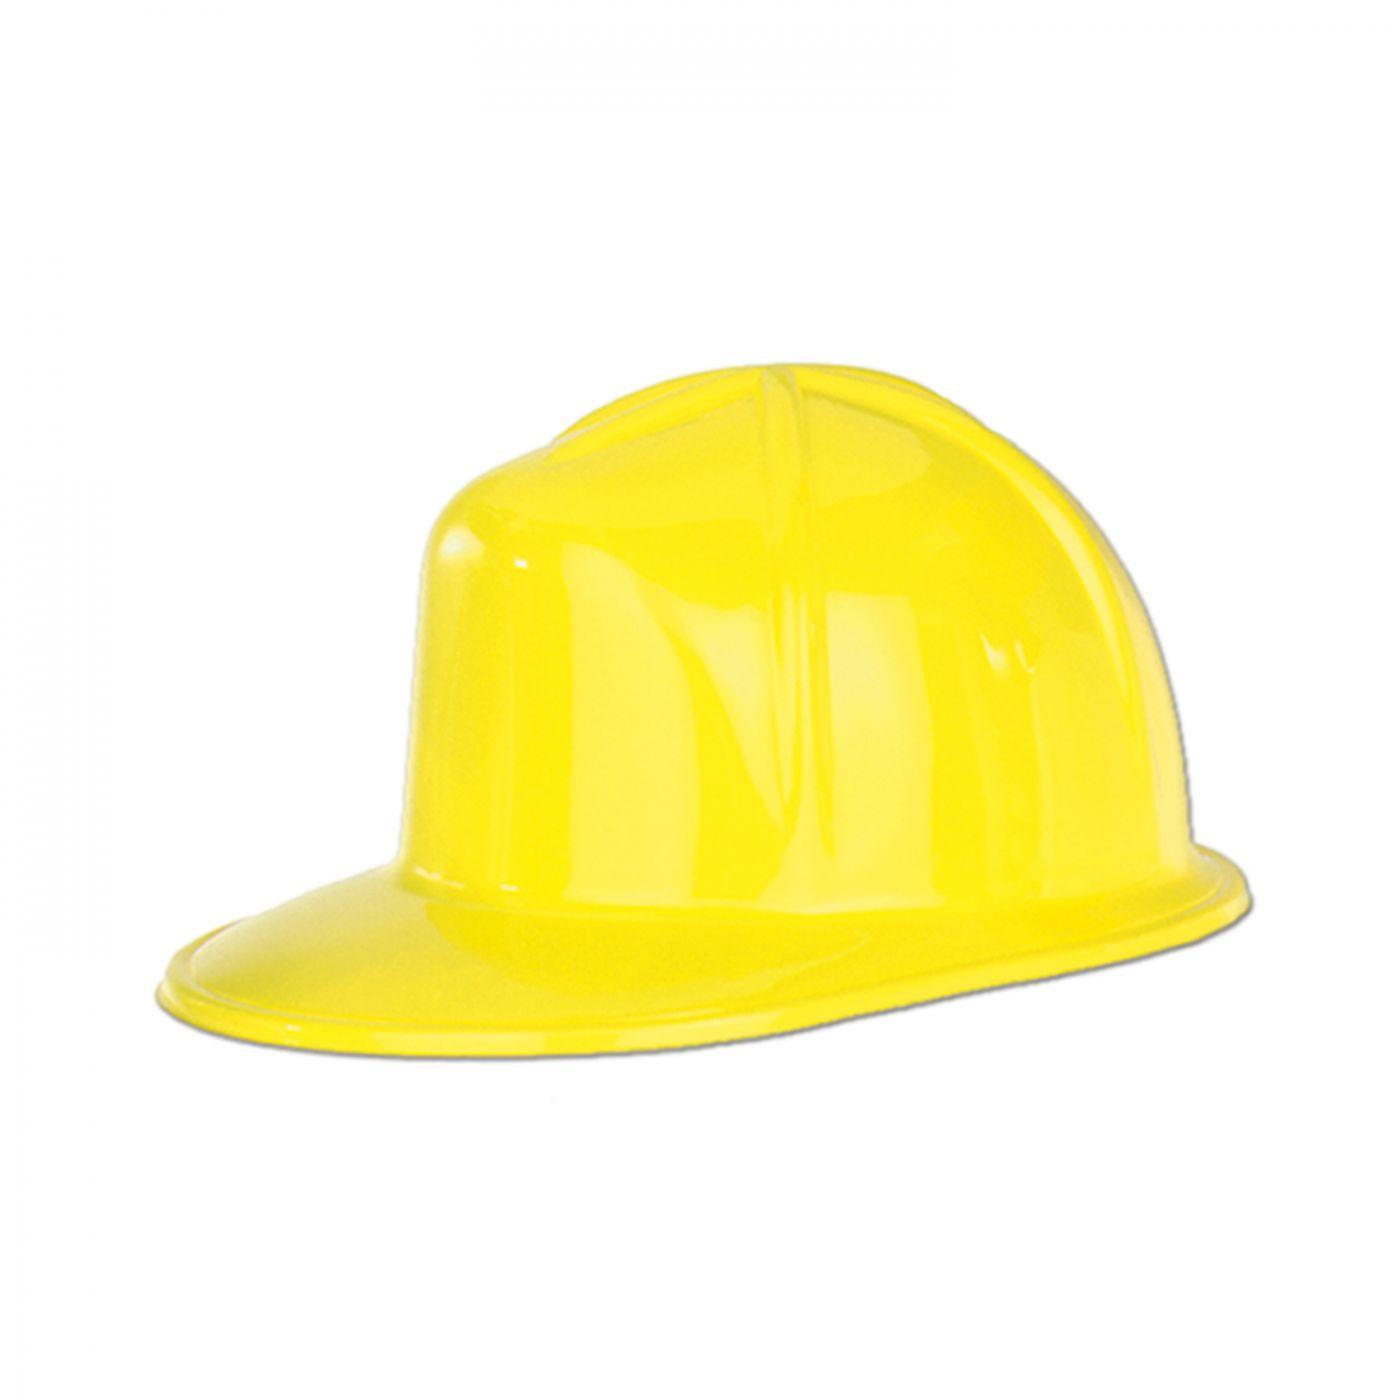 Yellow Plastic Construction Helmet (48) image